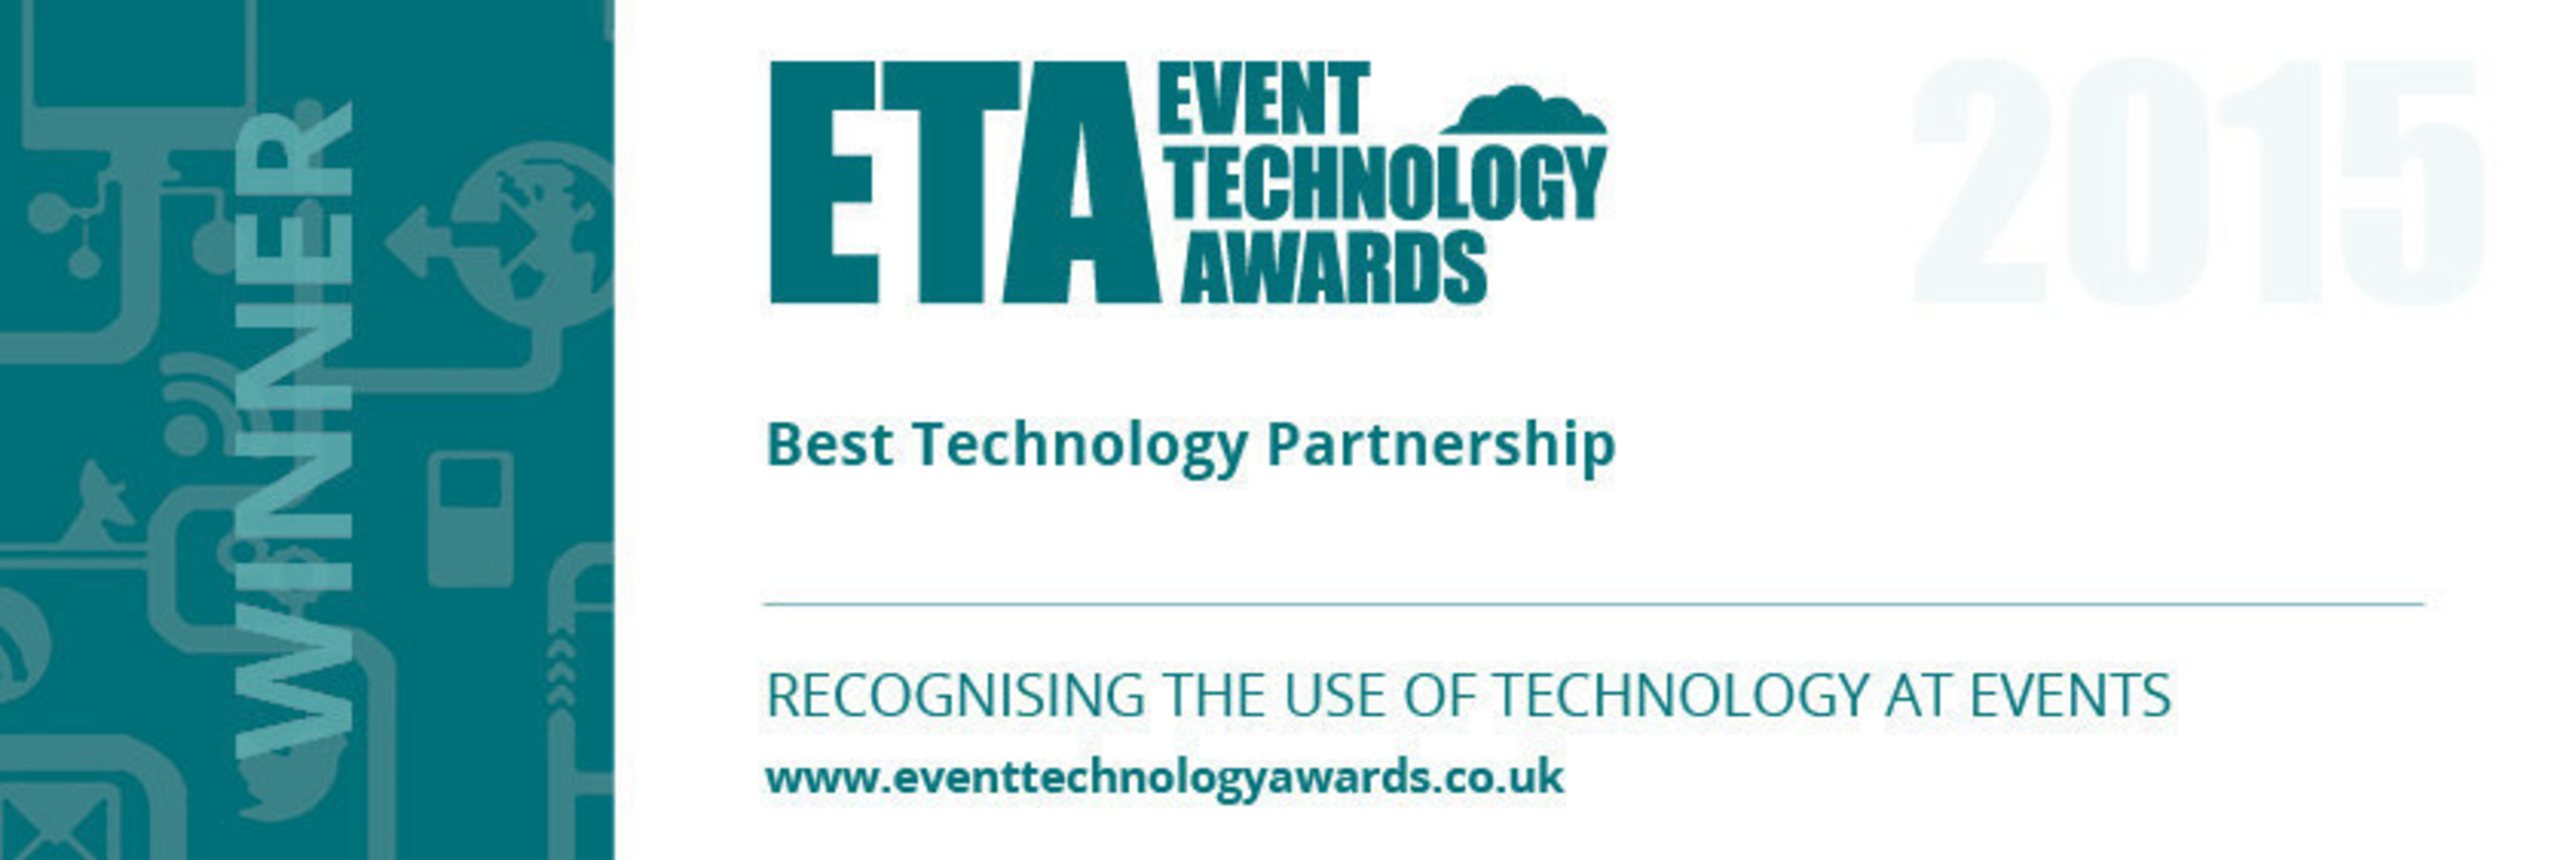 "Event Technology Award for ""Best Technology Partnership"""